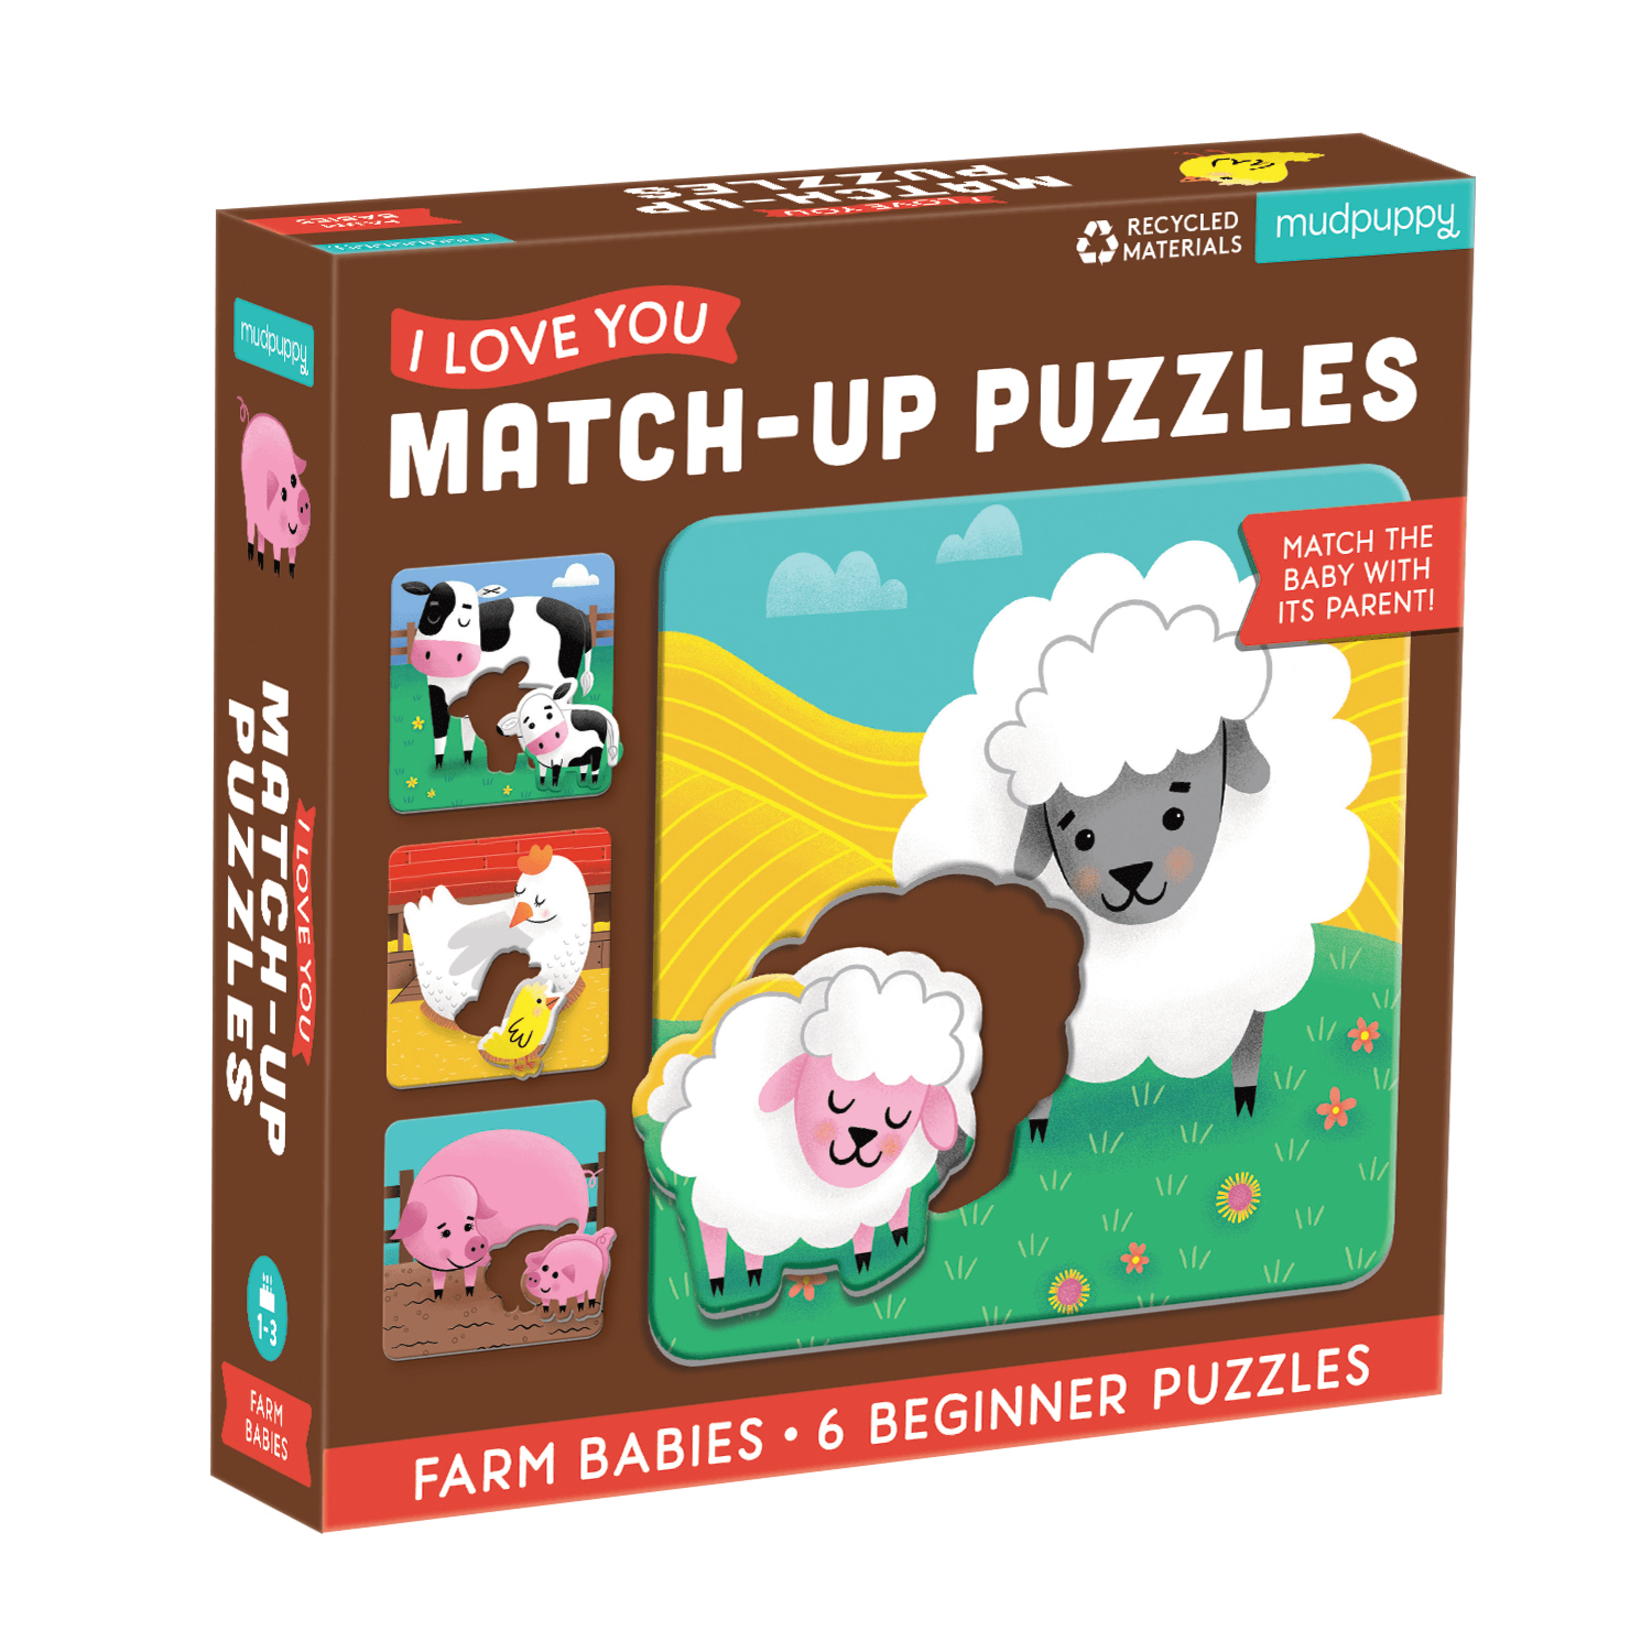 Mudpuppy Farm Babies Match Up 6pc